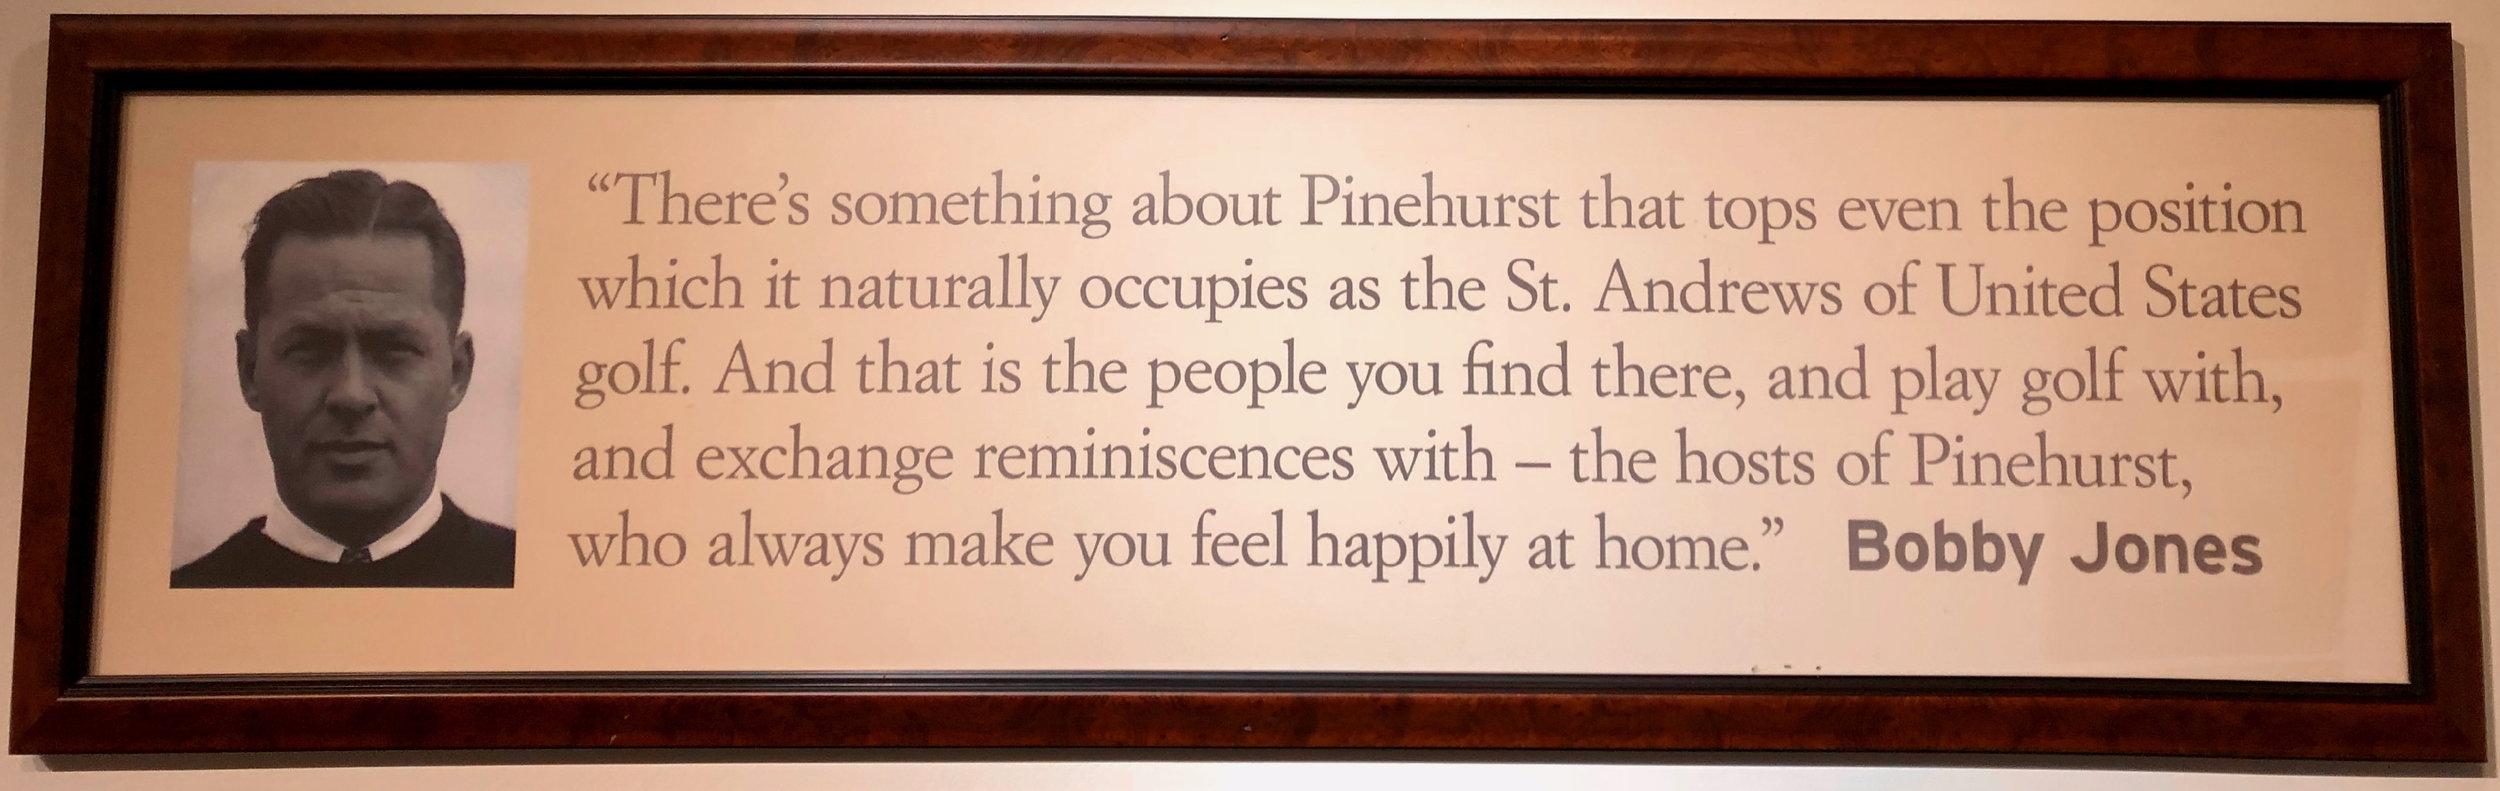 Bobby Jones Quote Pinehurst BJCWC.jpg